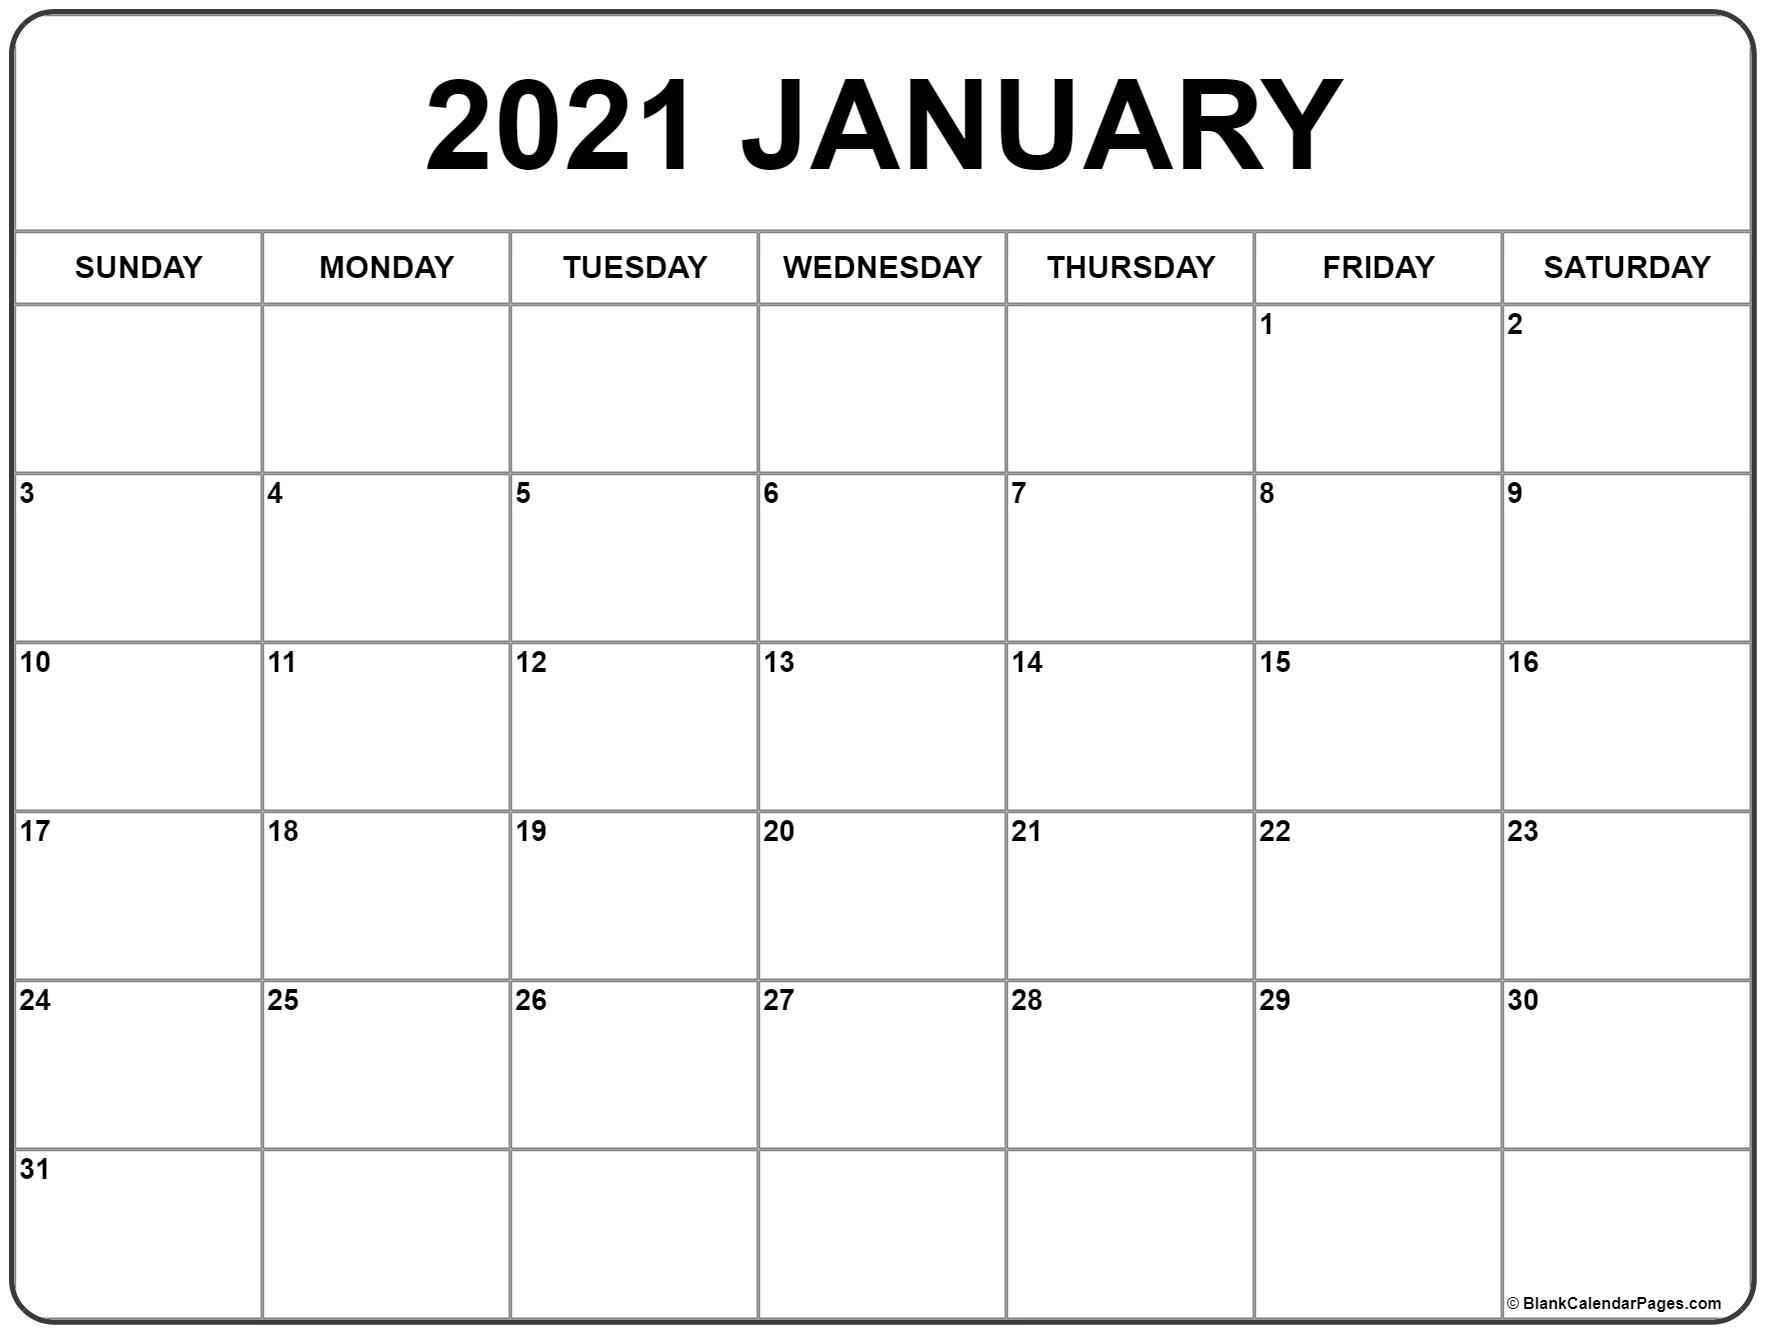 January 2021 Calendar | Free Printable Monthly Calendars